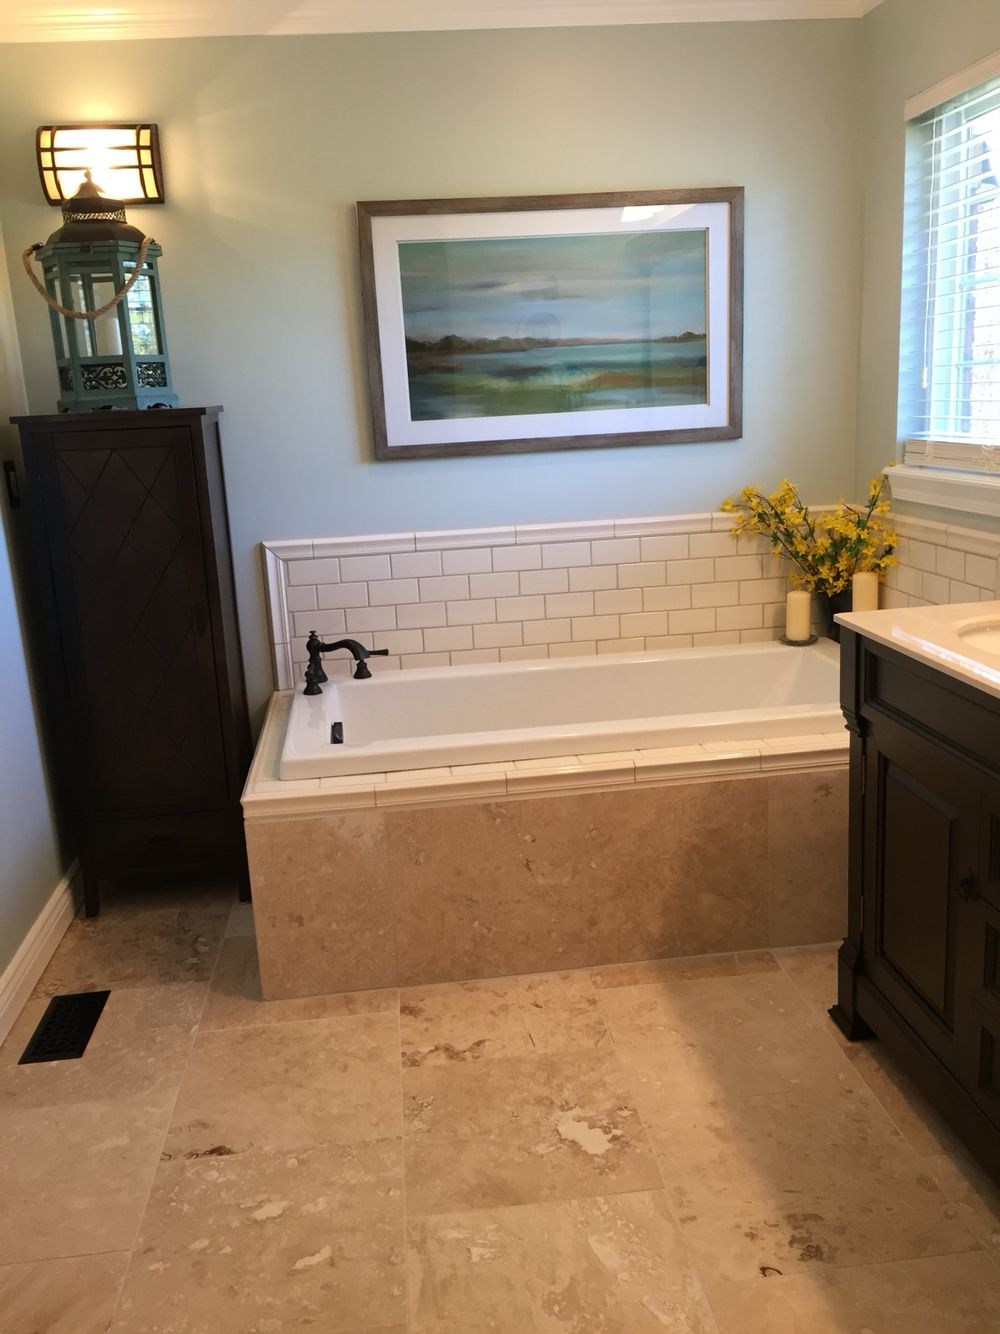 Sherwin Williams Sea Salt Paint With Travertine 18 Floor Tile And Cream Subway Tile Travertine Bathroom Bathroom Color Schemes Bathroom Colors